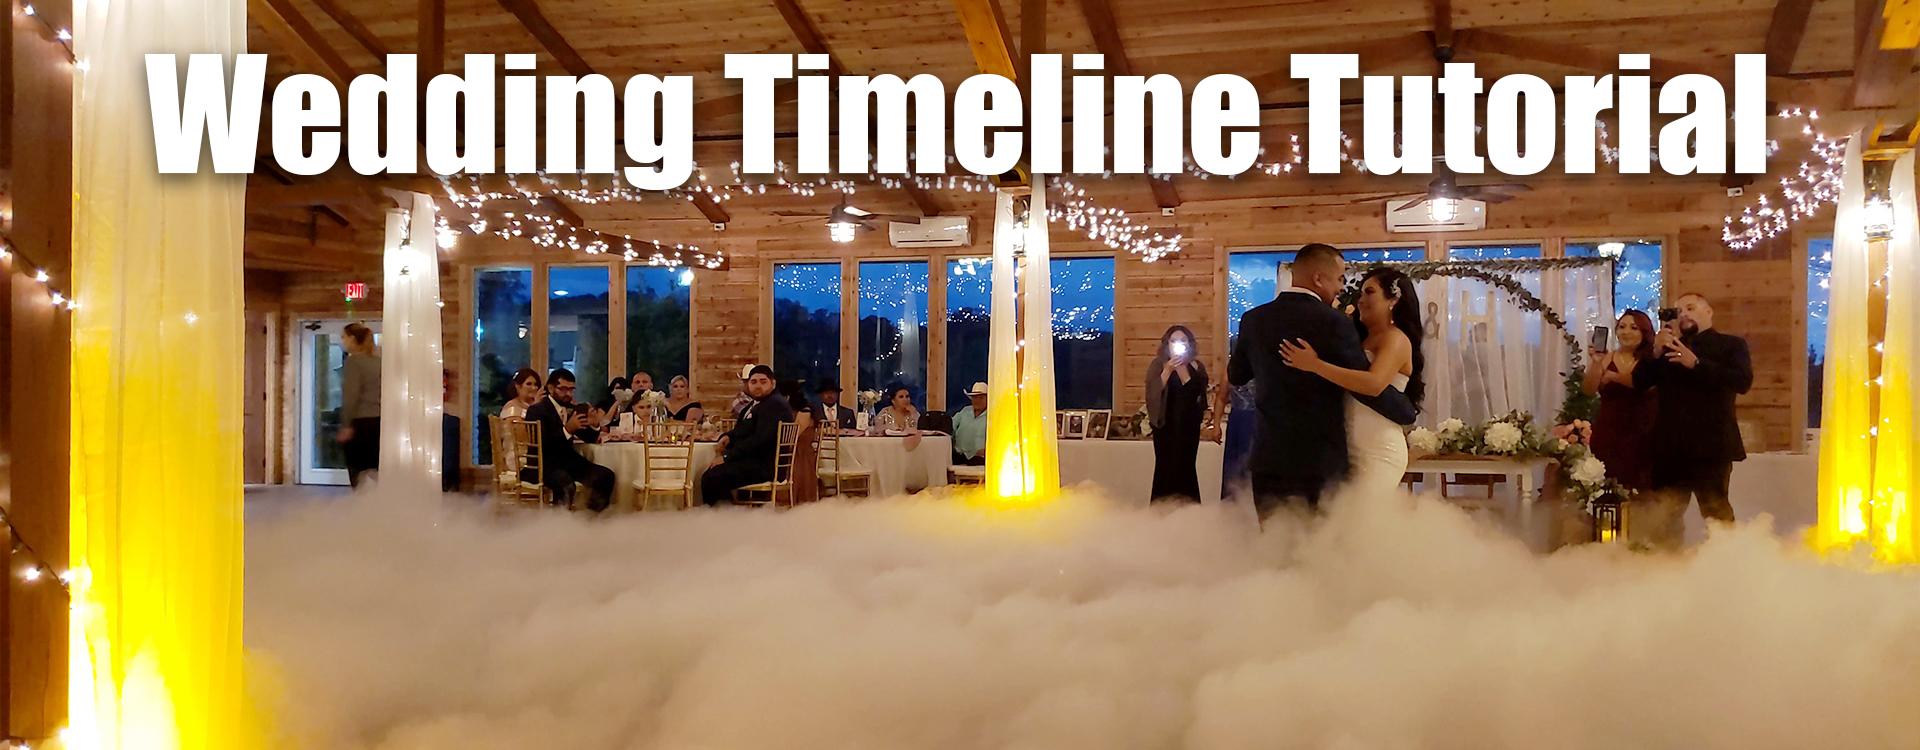 WeddingPlanningTutorial